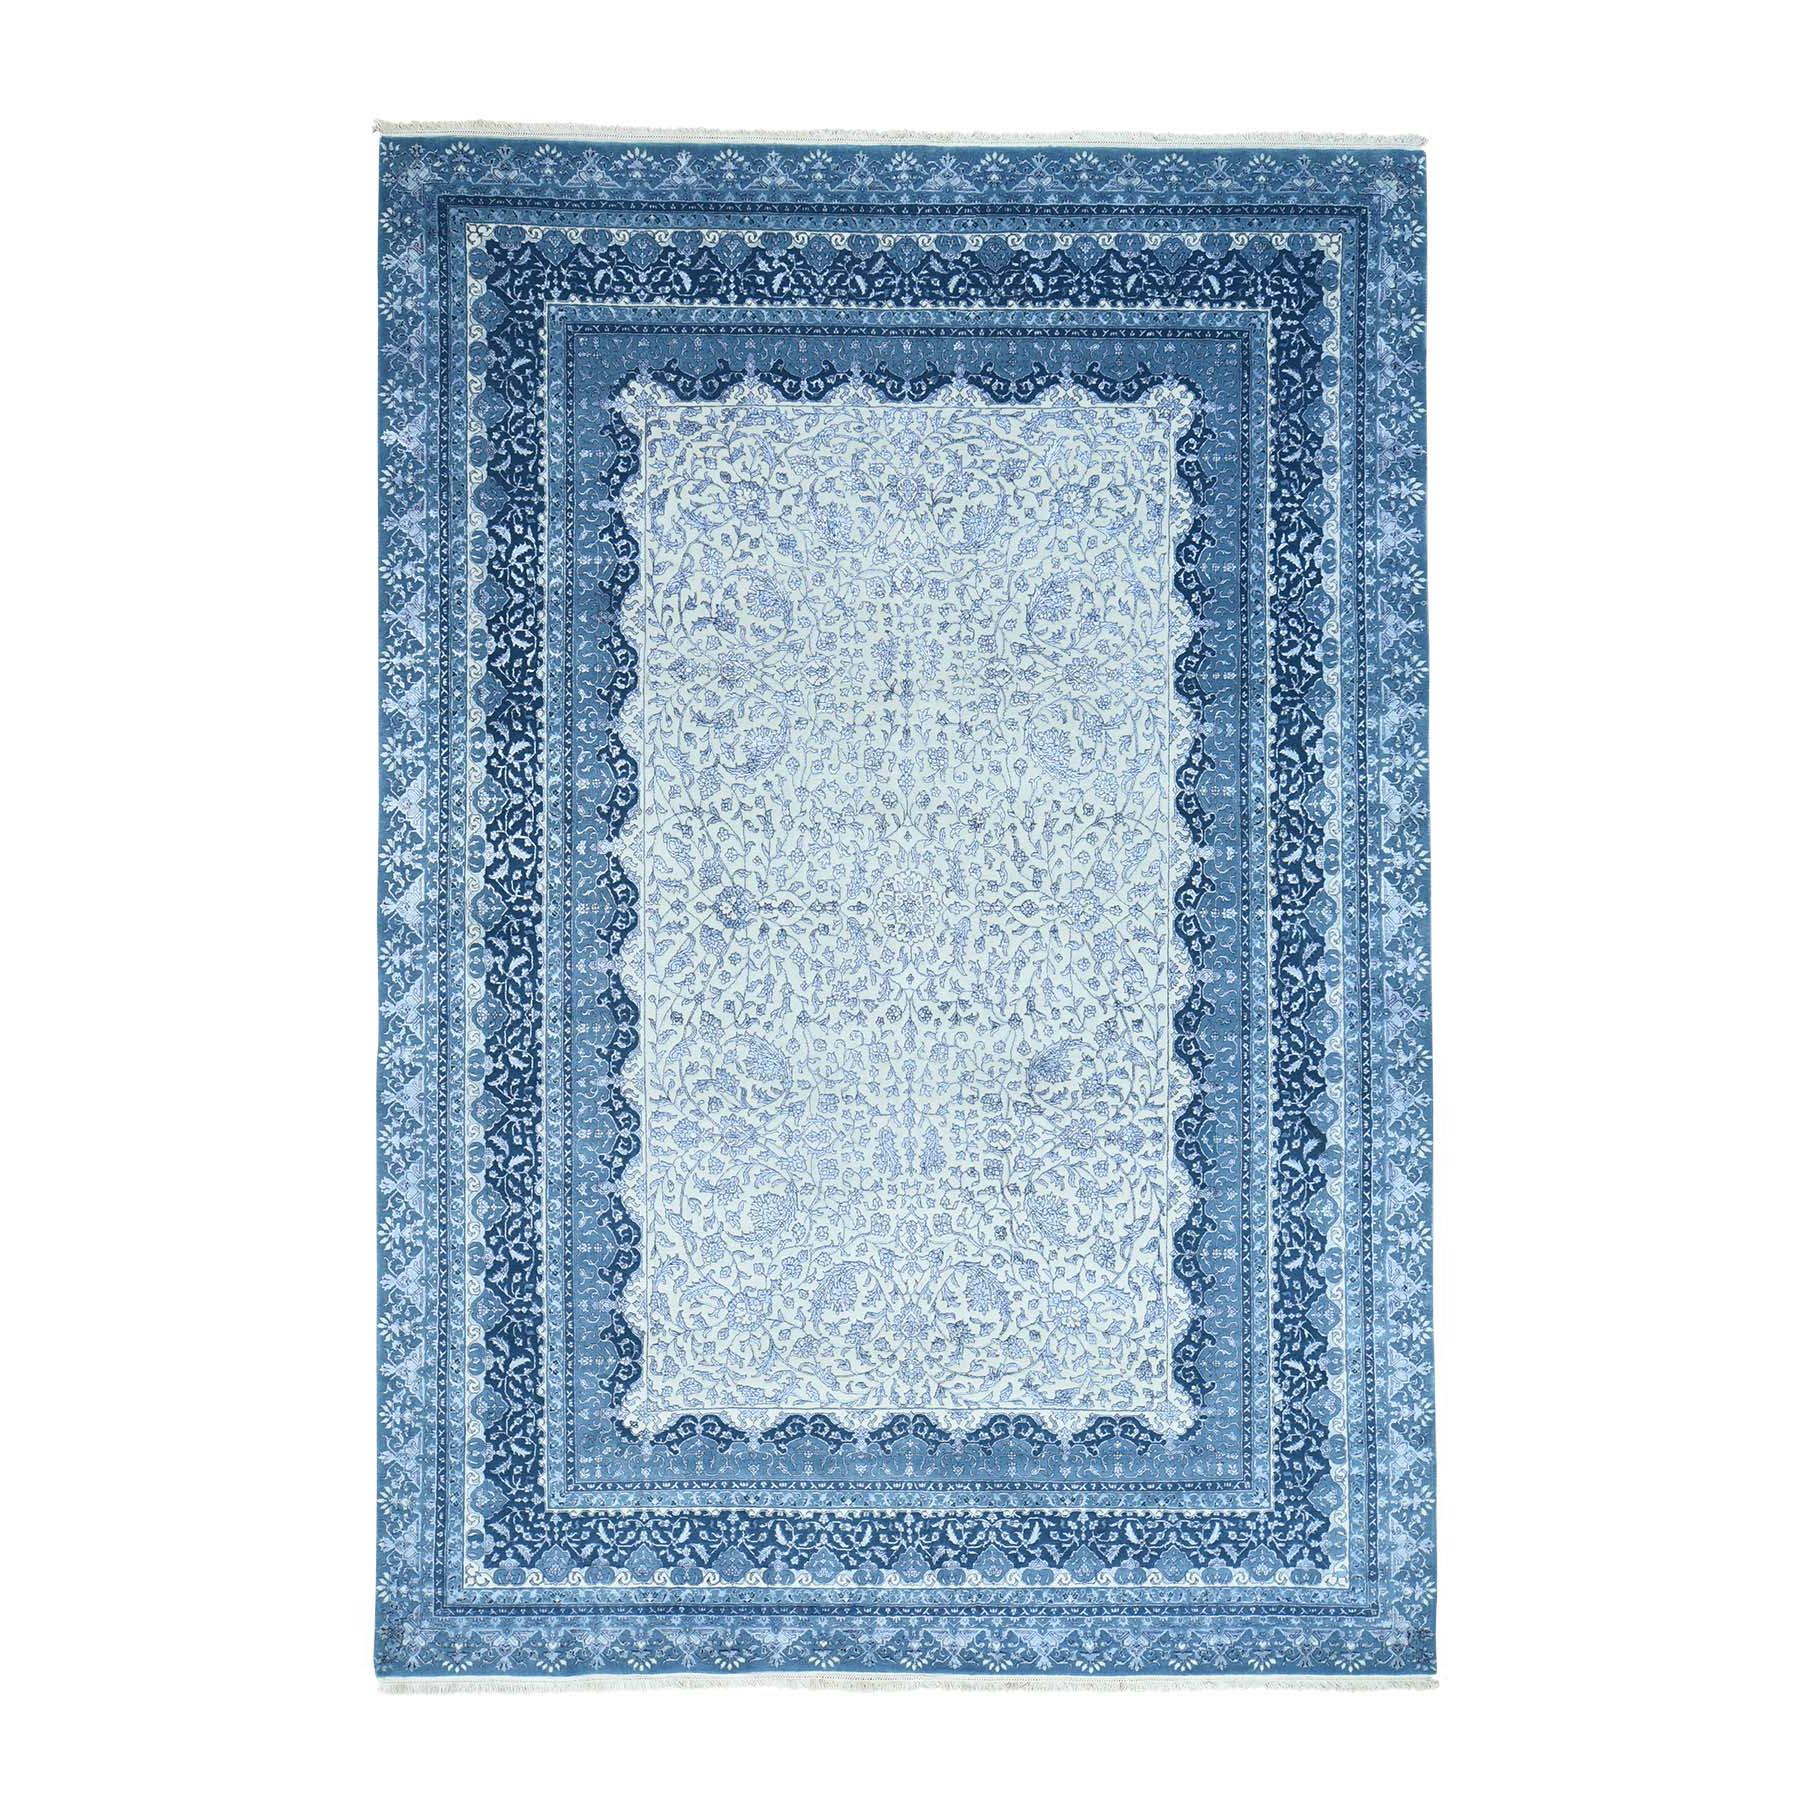 "7'10""x11'5"" Hand-Knotted Kashan Half Wool Half Silk 300 Kpsi Rug"